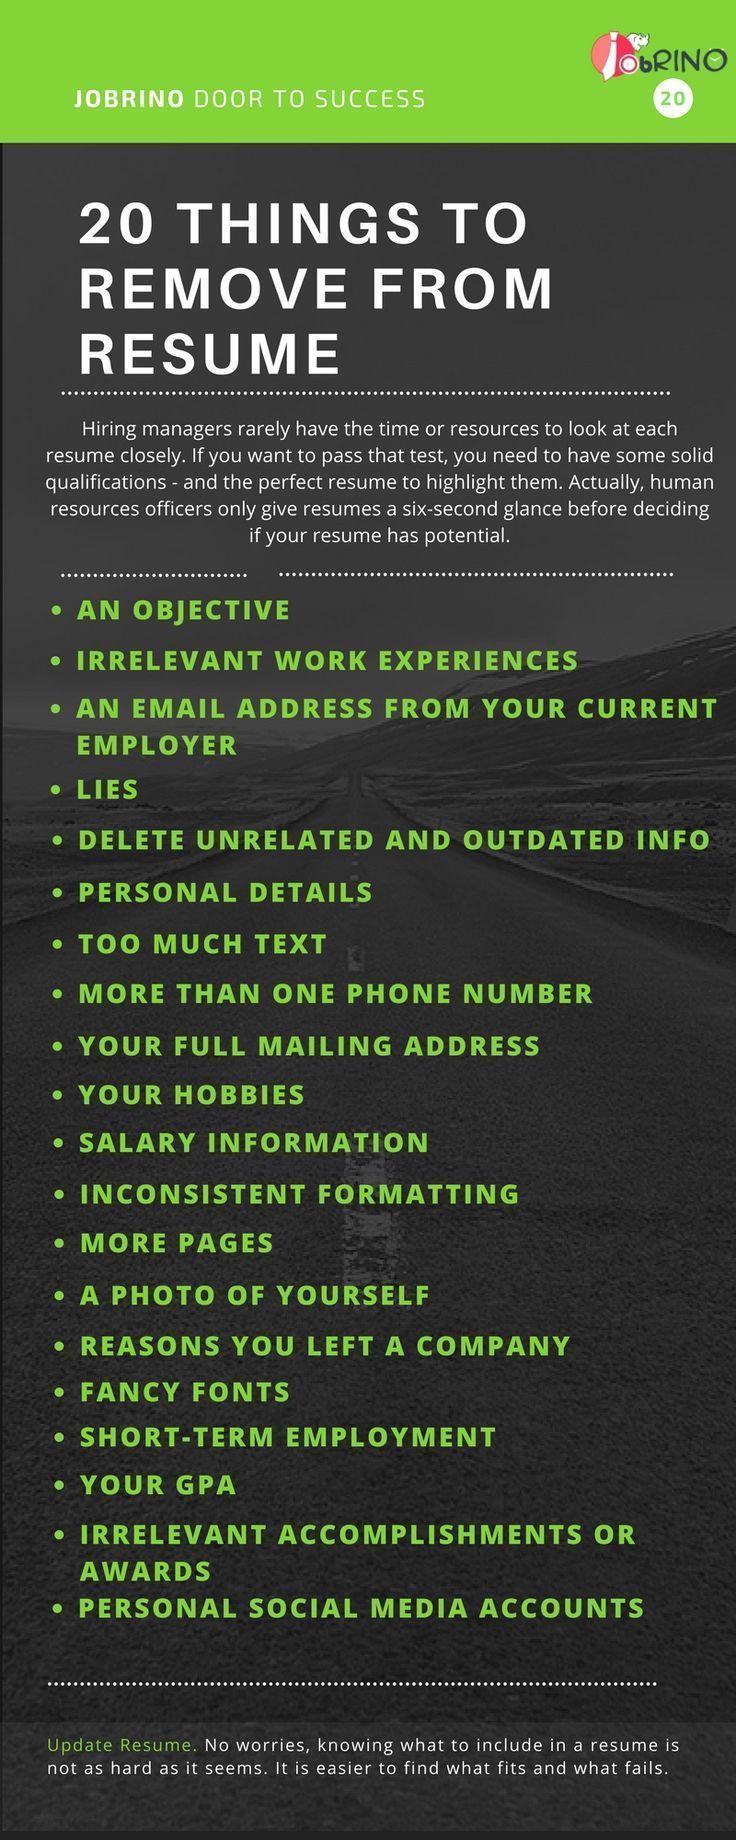 Online business school effective resume resume writing tips